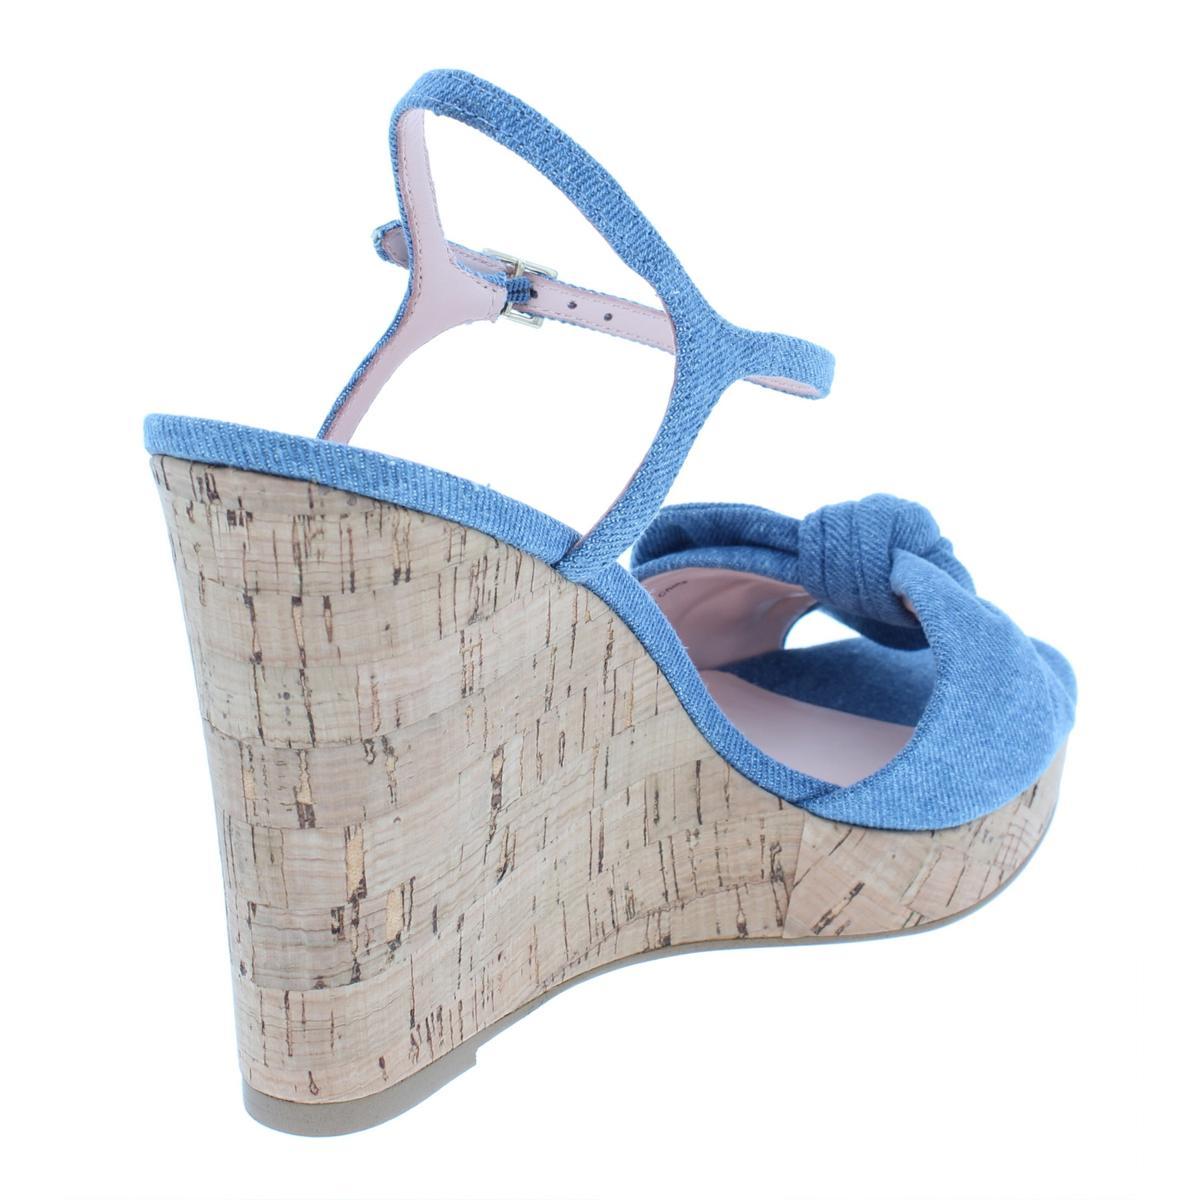 f8668ee69f60 Kate Spade Womens Janae Bow Wedge Sandals Shoes BHFO 9390